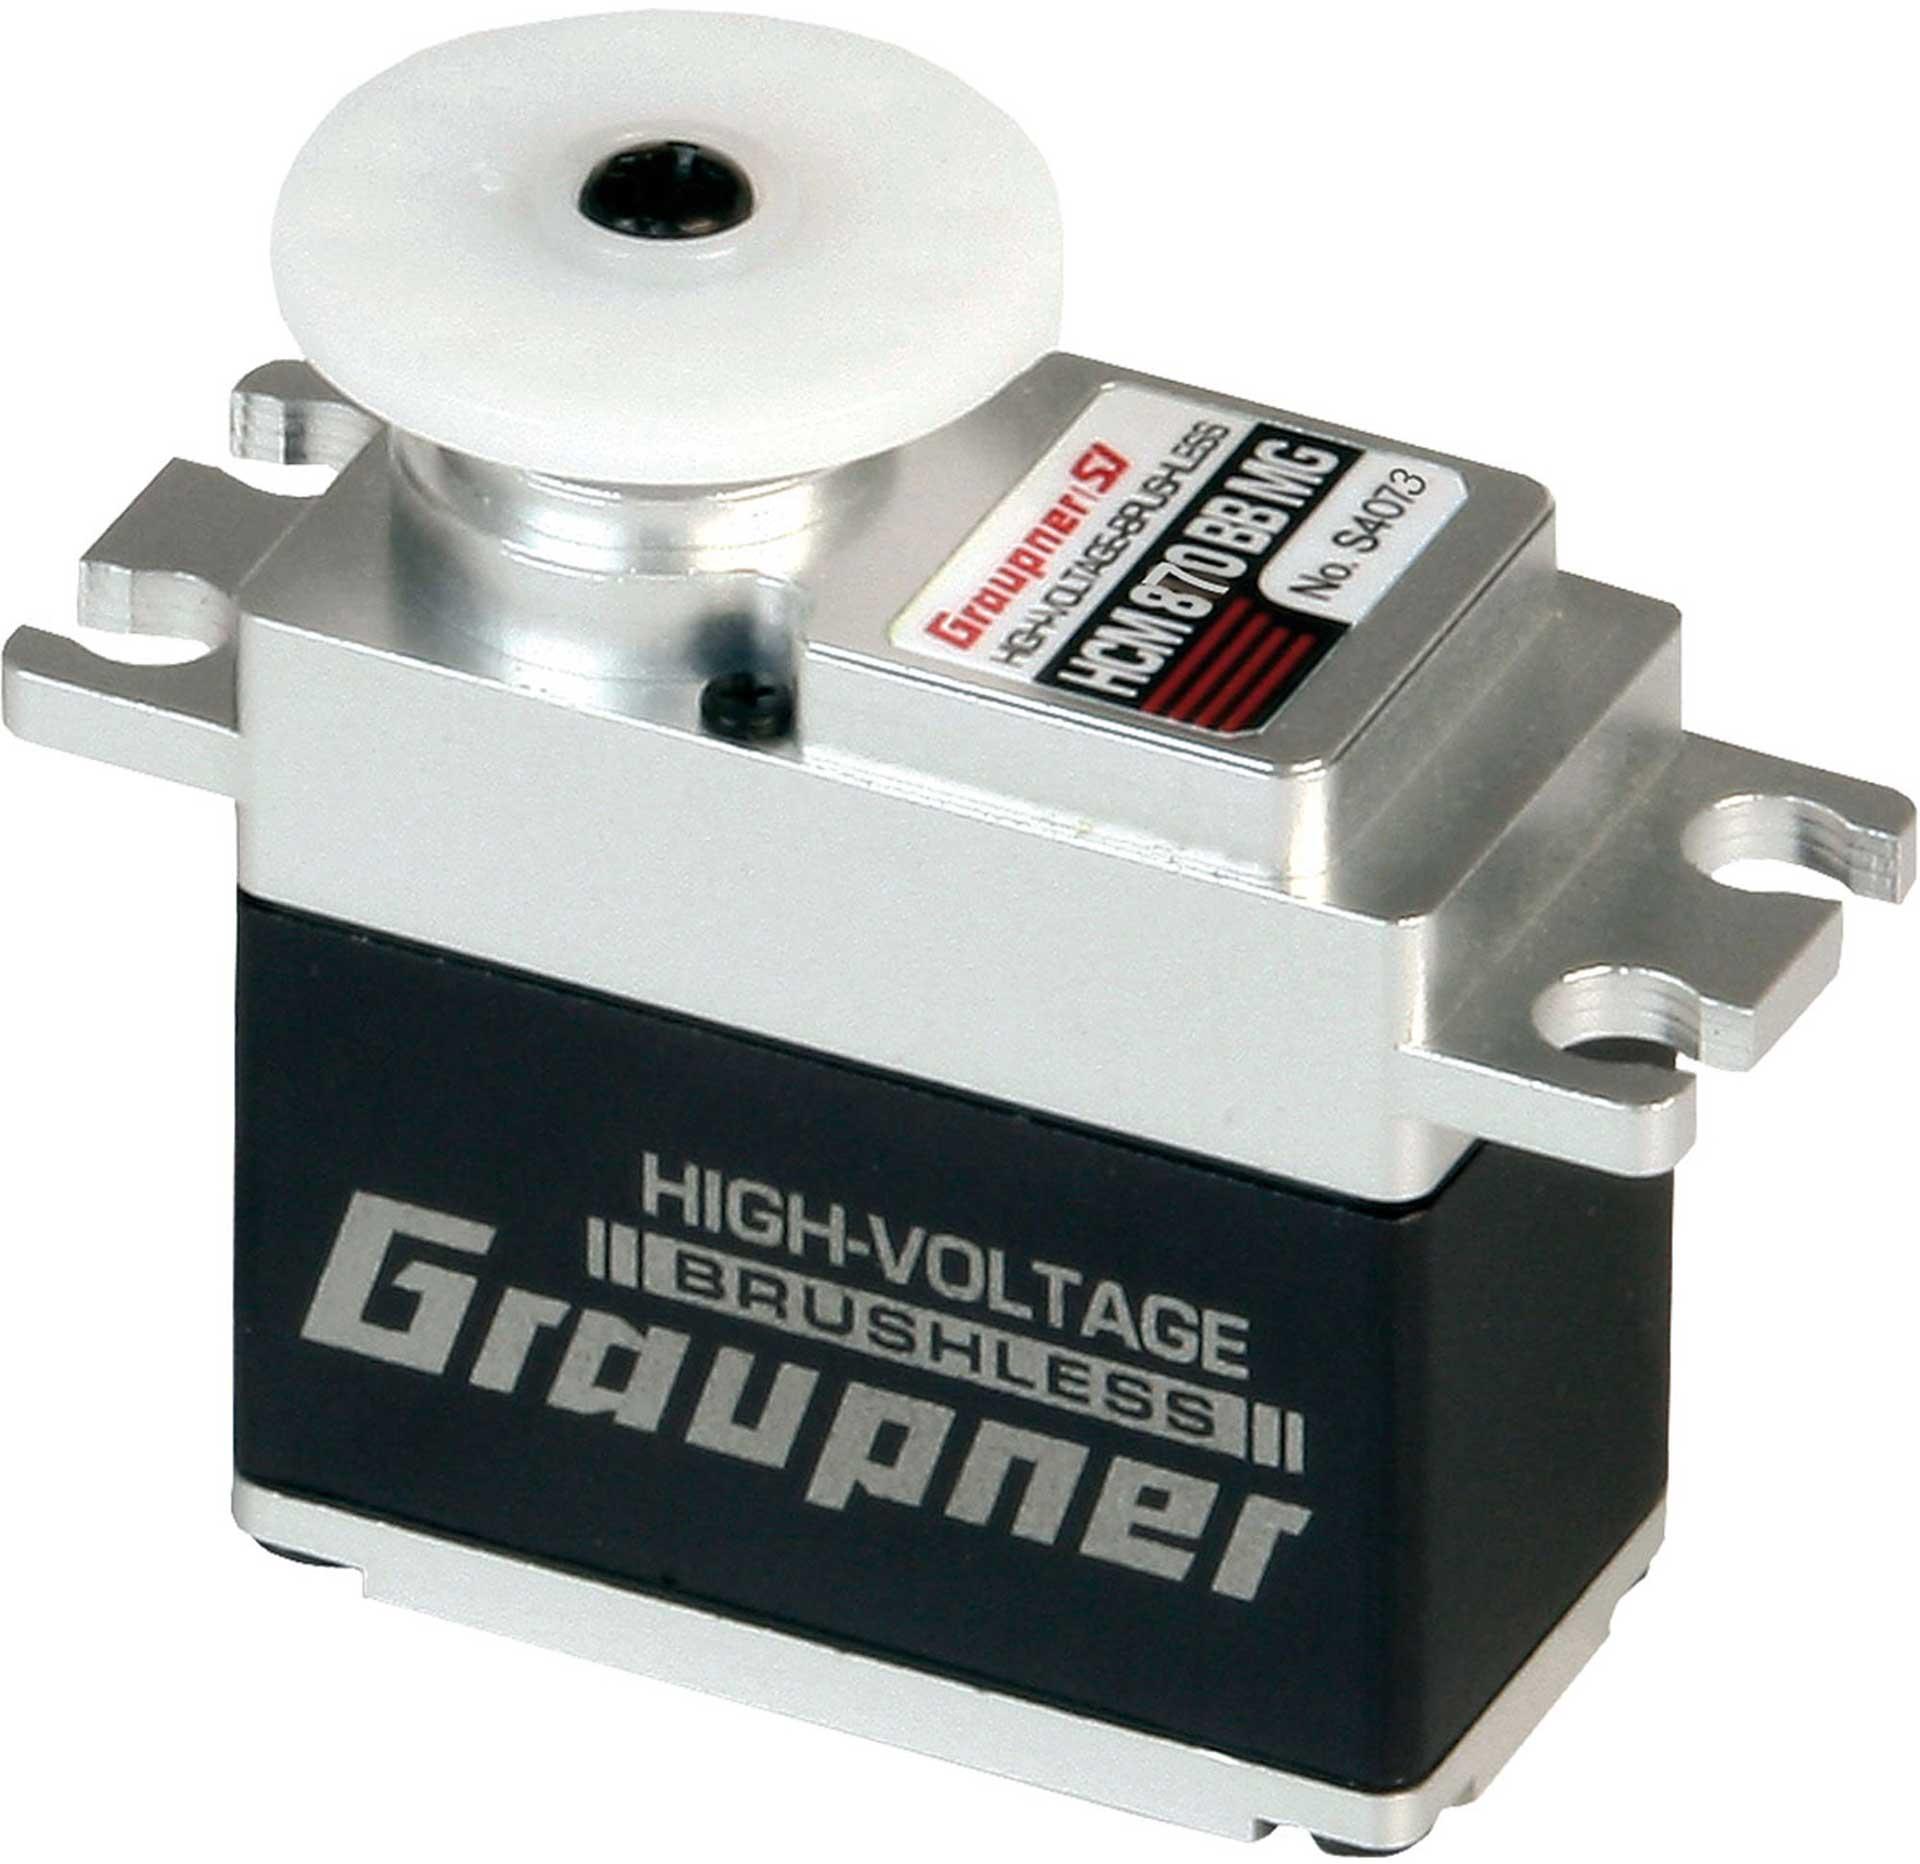 GRAUPNER HCM 870 BB MG DIGI HV CORELESS SPEED WITH 20MM WIDTH